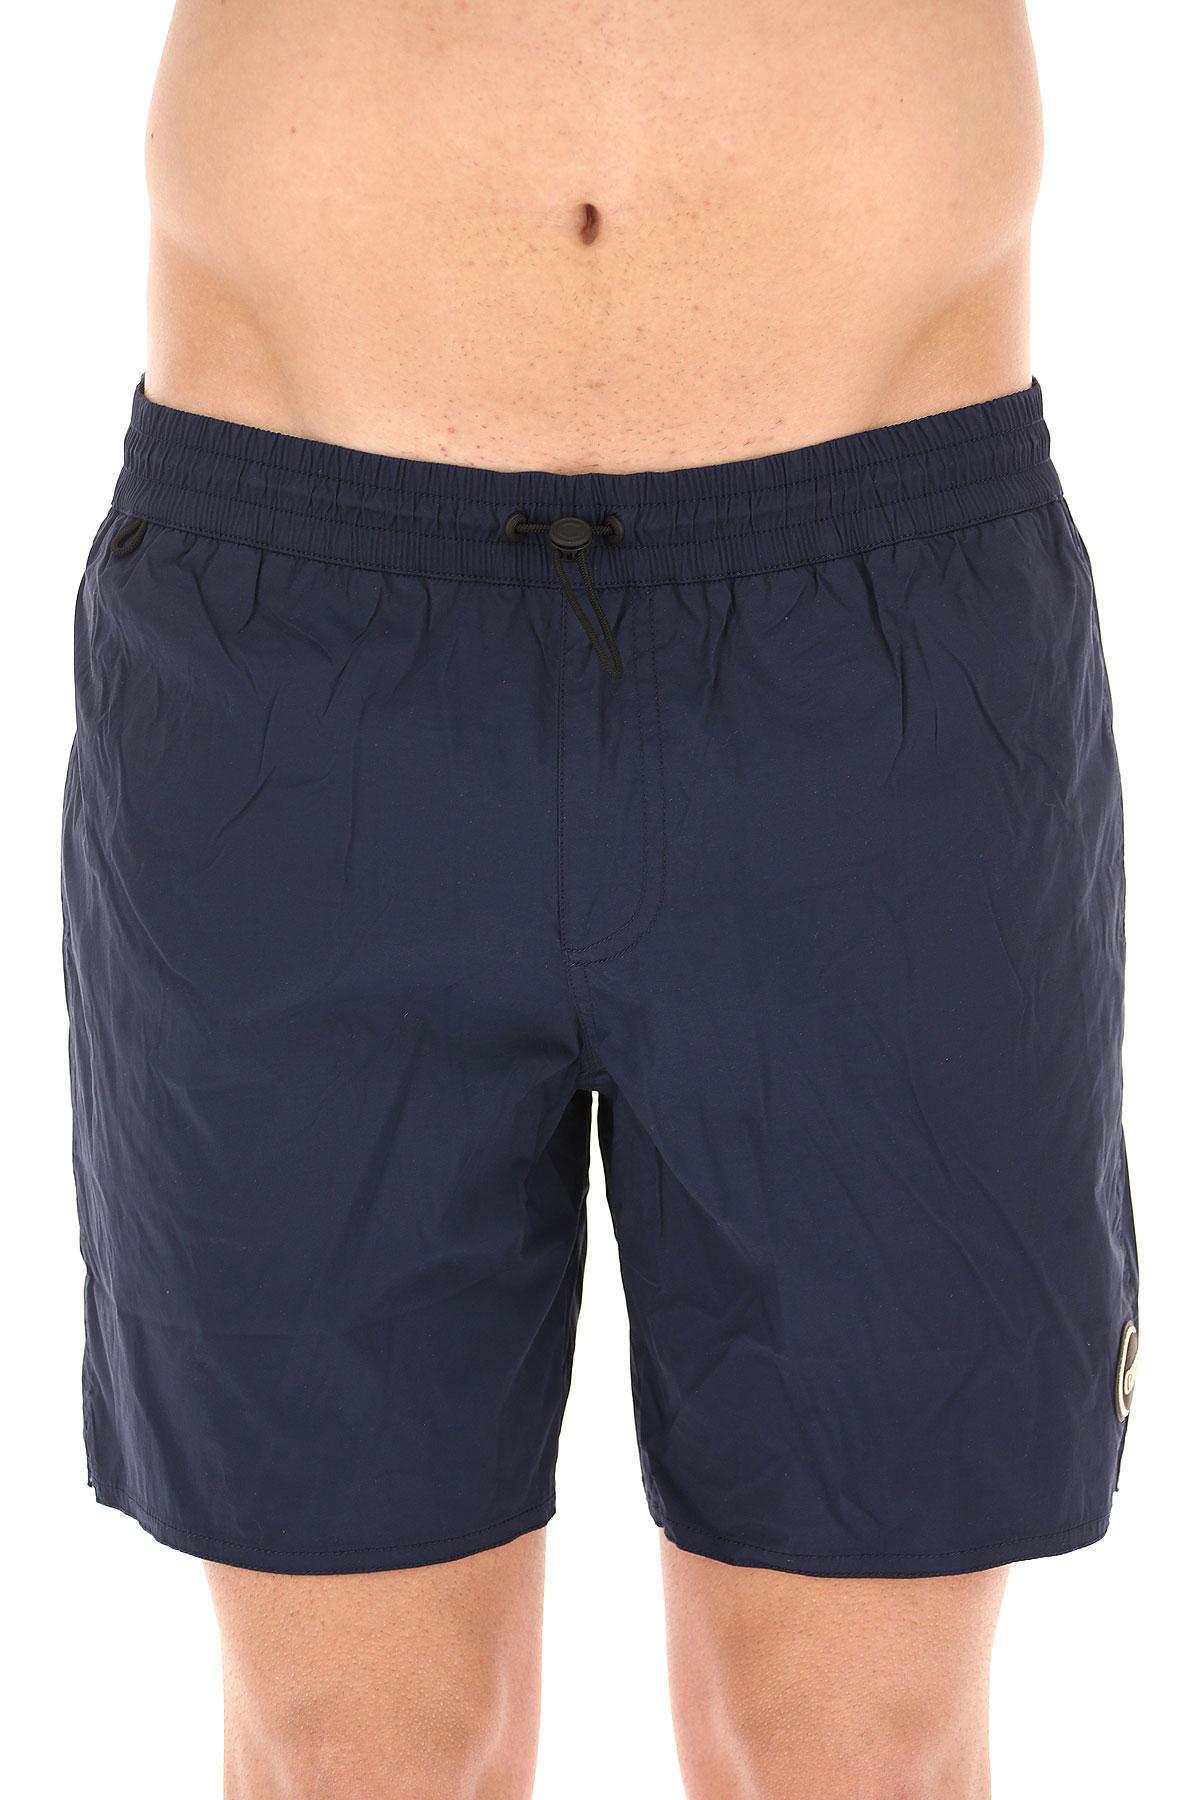 Image of Colmar Swim Shorts Trunks for Men On Sale, Dark Blue, polyamide, 2017, L (EU 50) XXXL (EU 56)